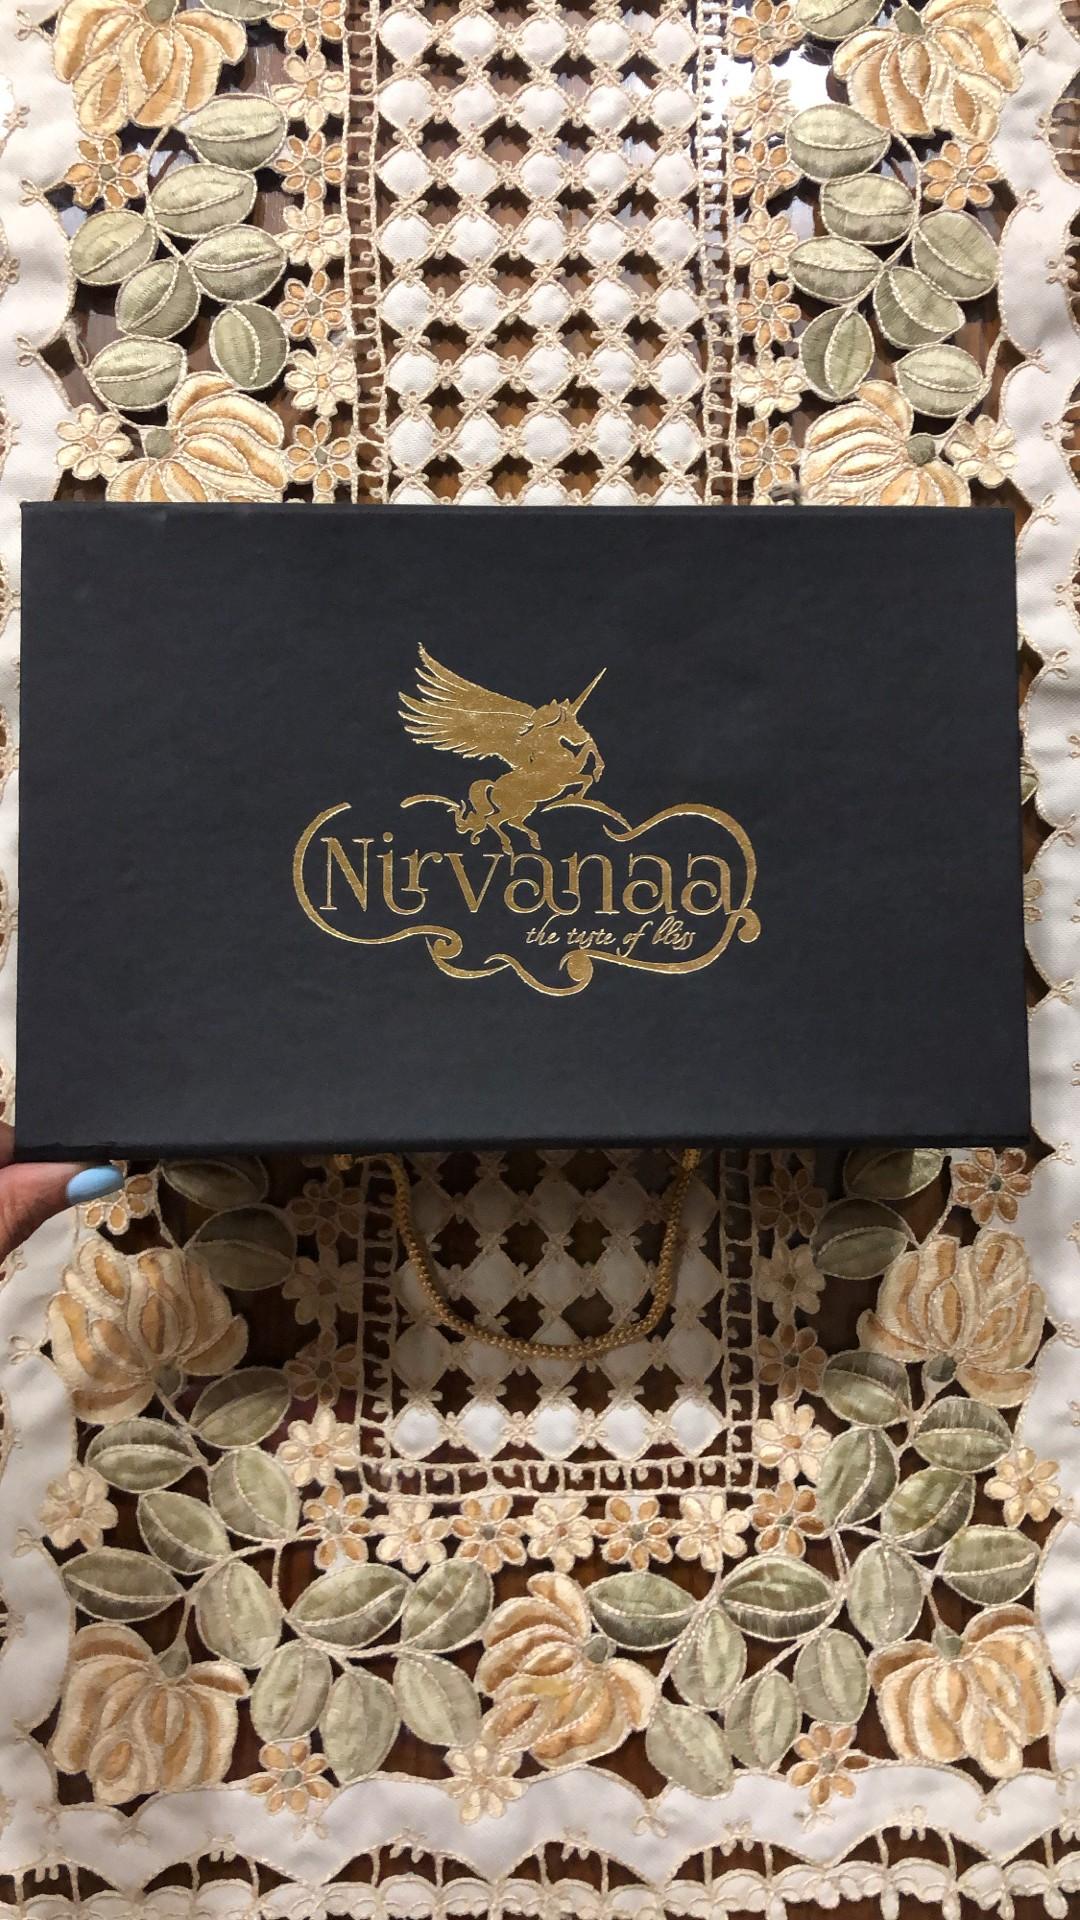 Nirvanna Chocolates